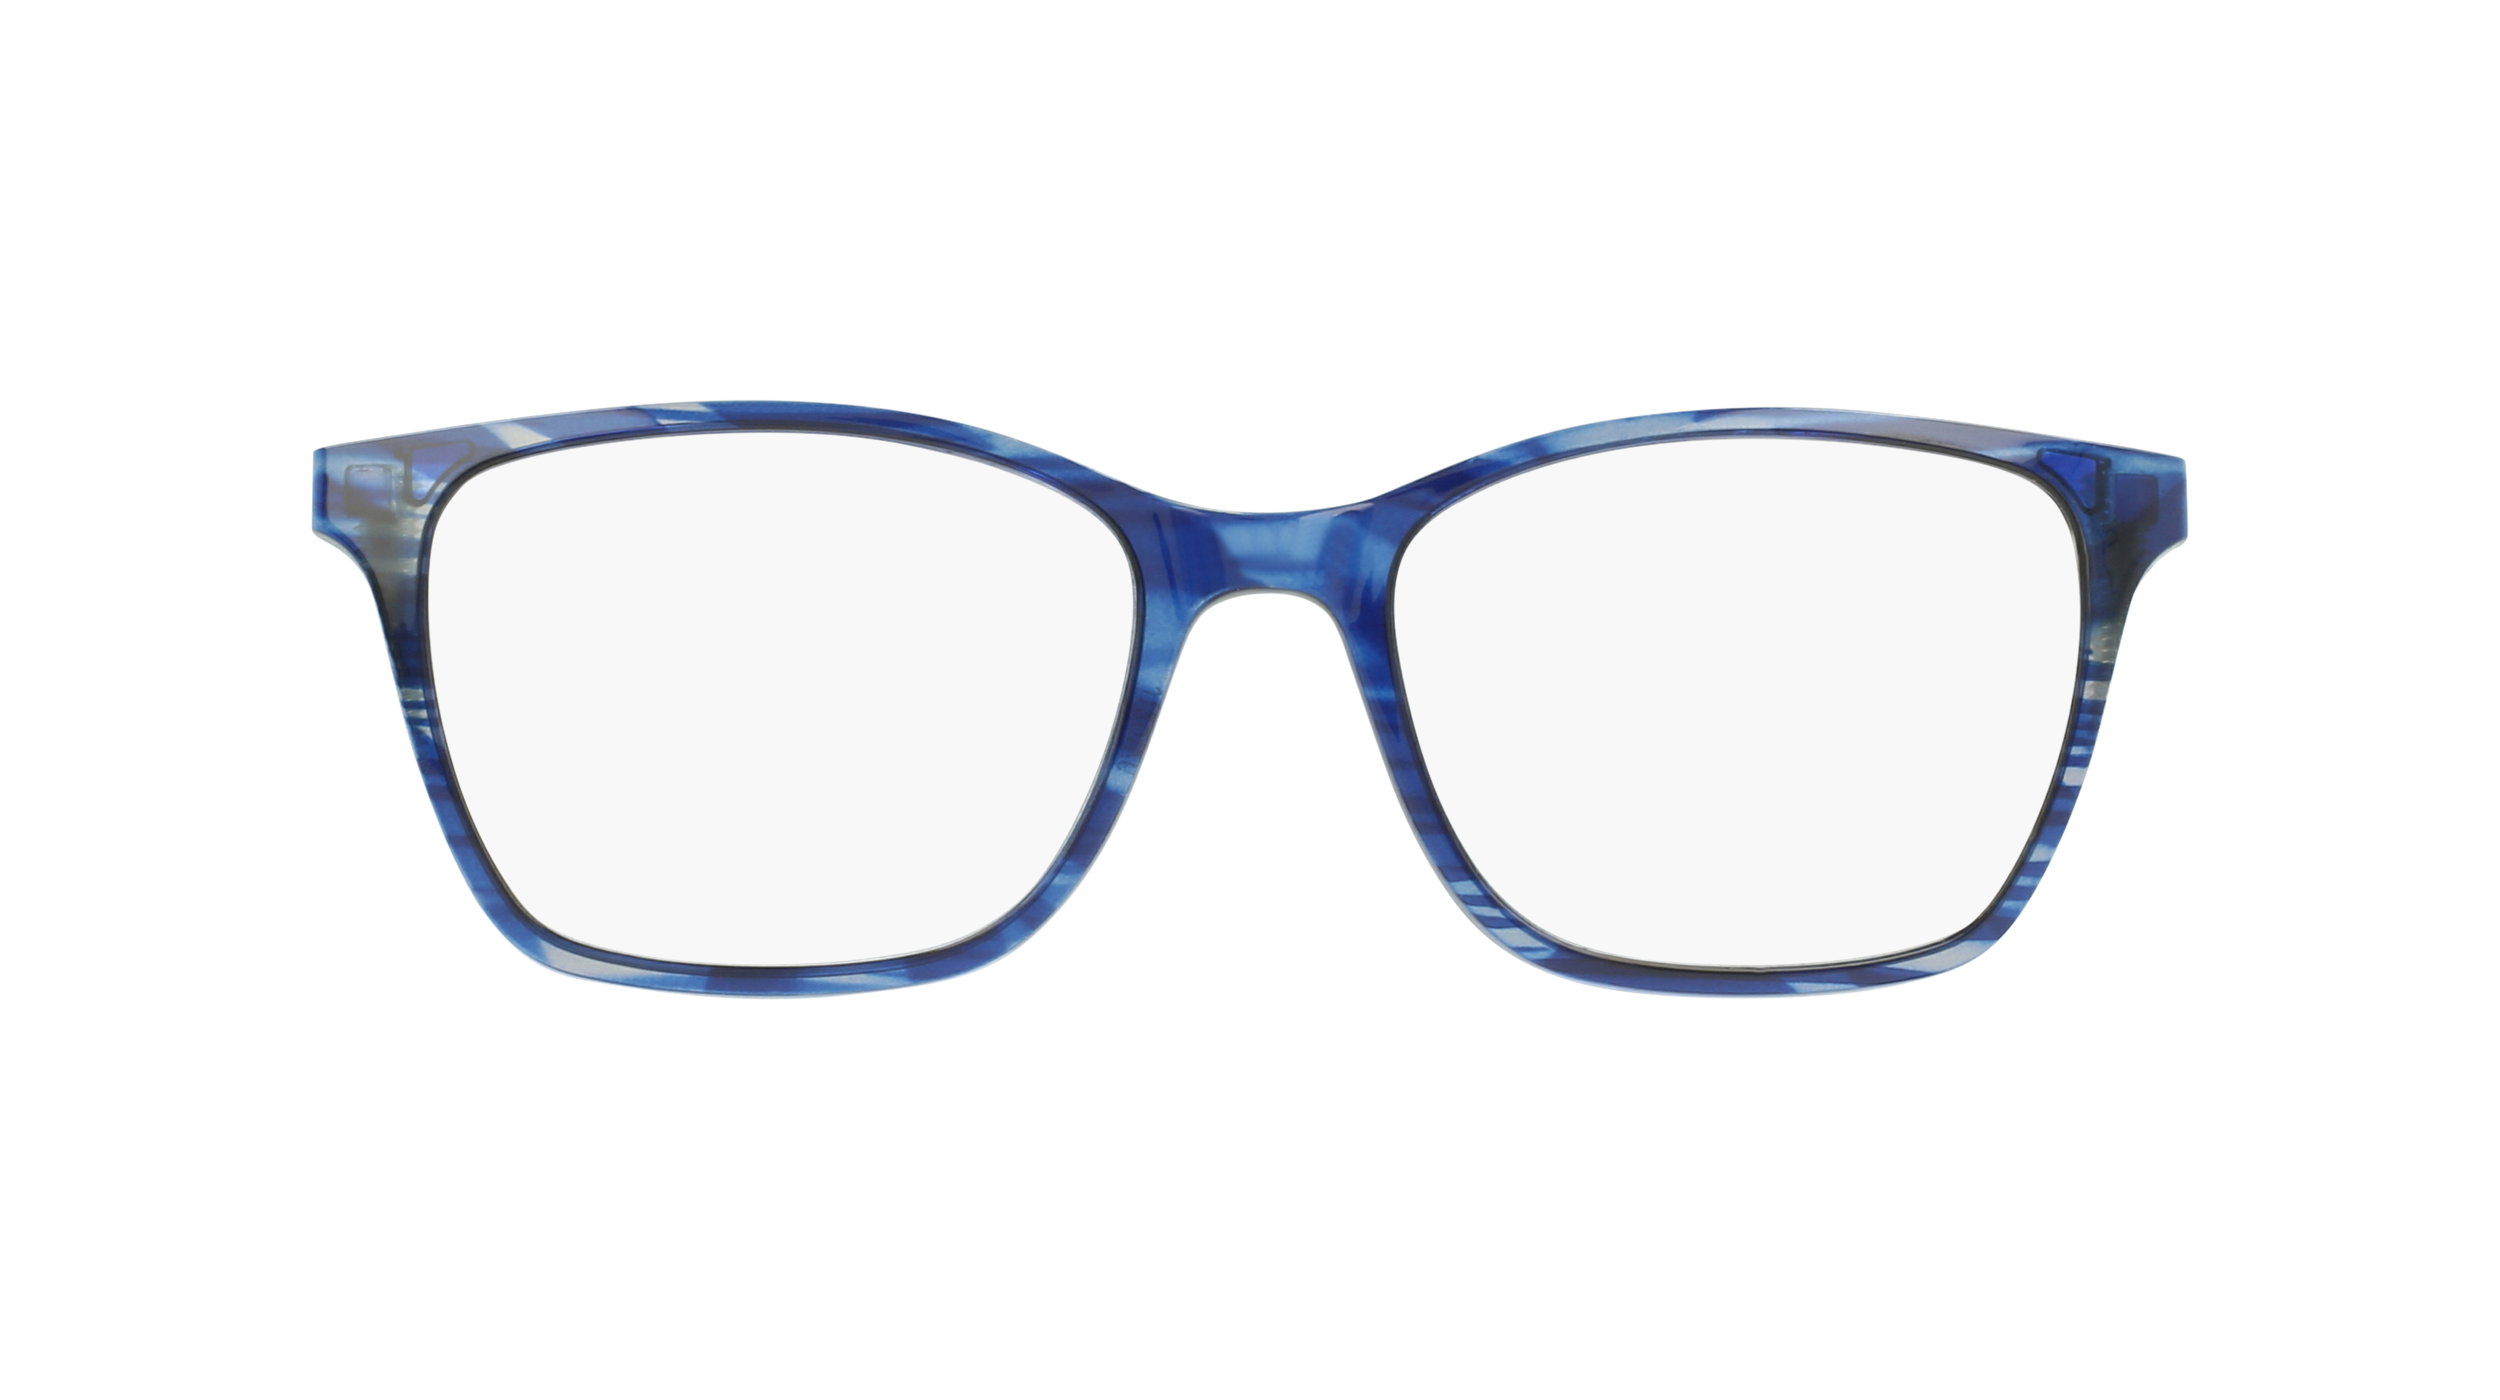 afflelou/france/products/smart_clip/clips_glasses/07630036457665.png